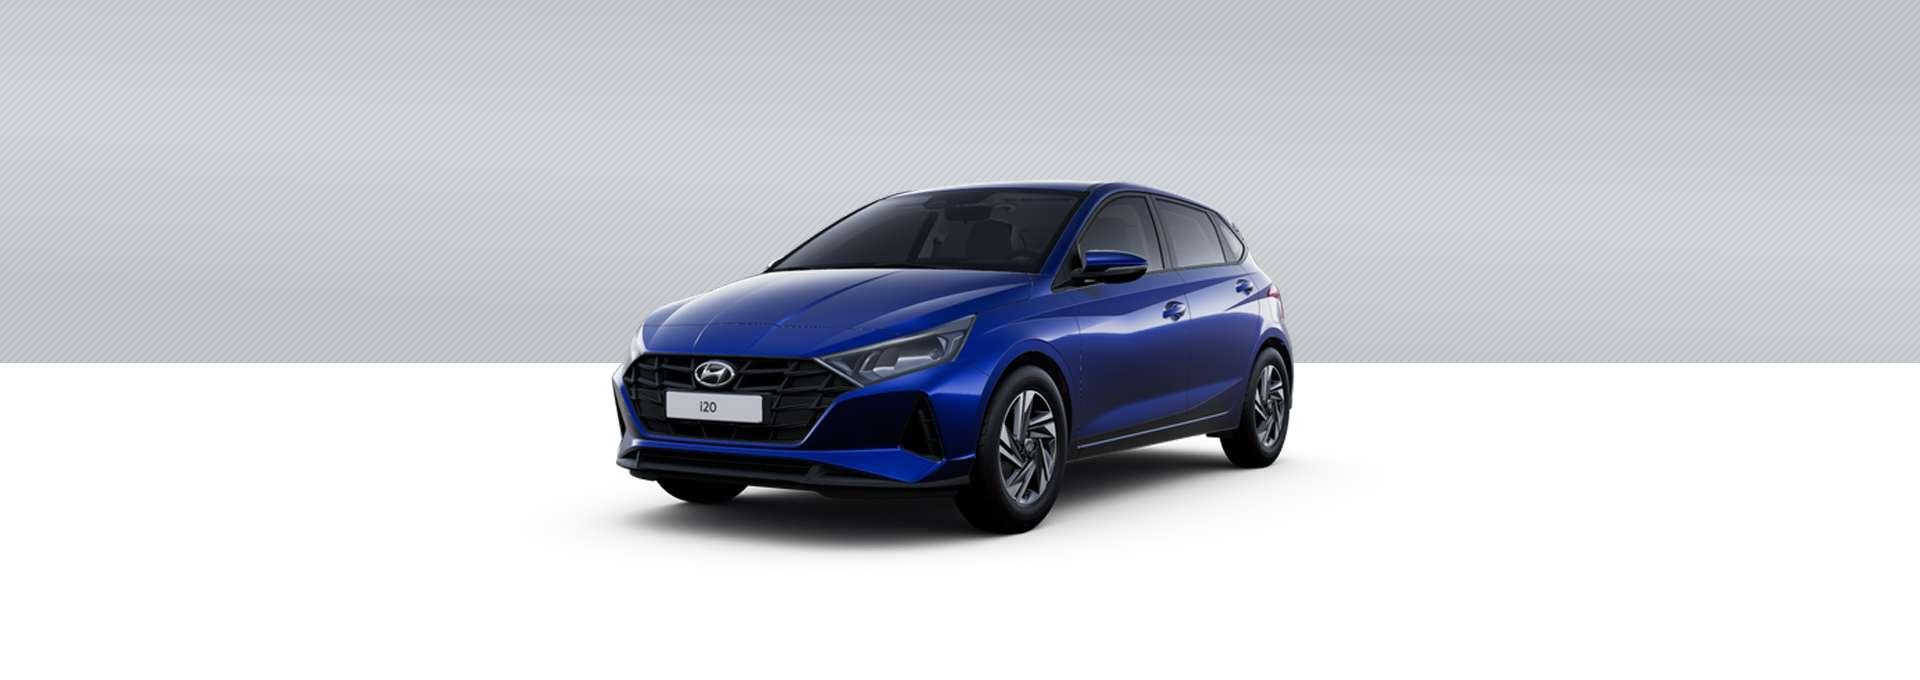 Hyundai Nuevo i20